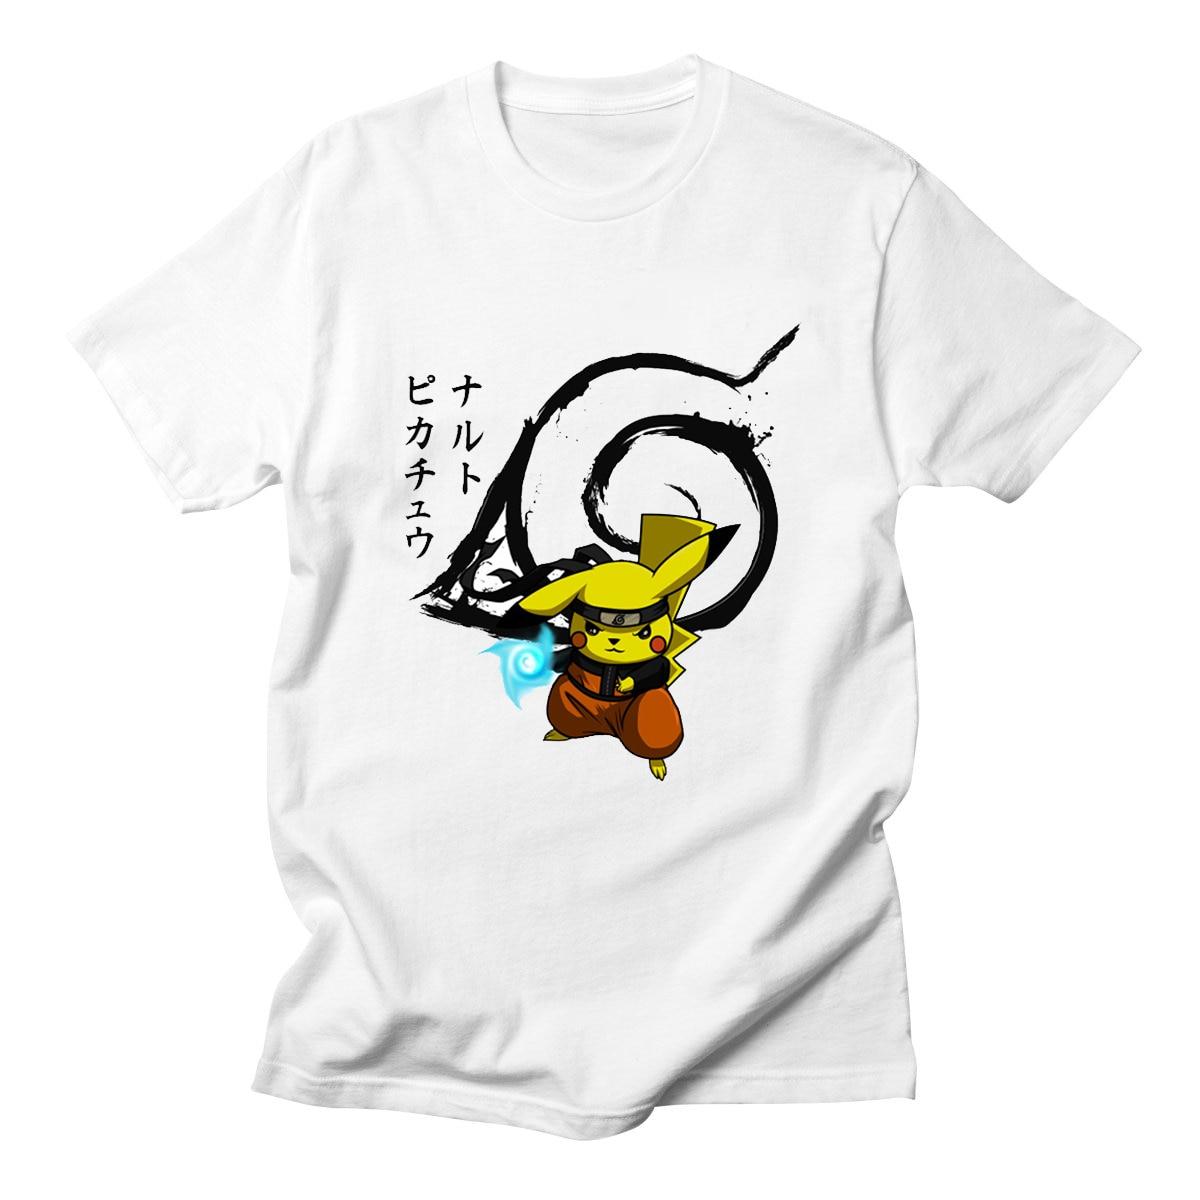 a58a7ebe4 Camiseta de Anime japonés Camiseta pokemon NARUTO Cosplay Naruto ...